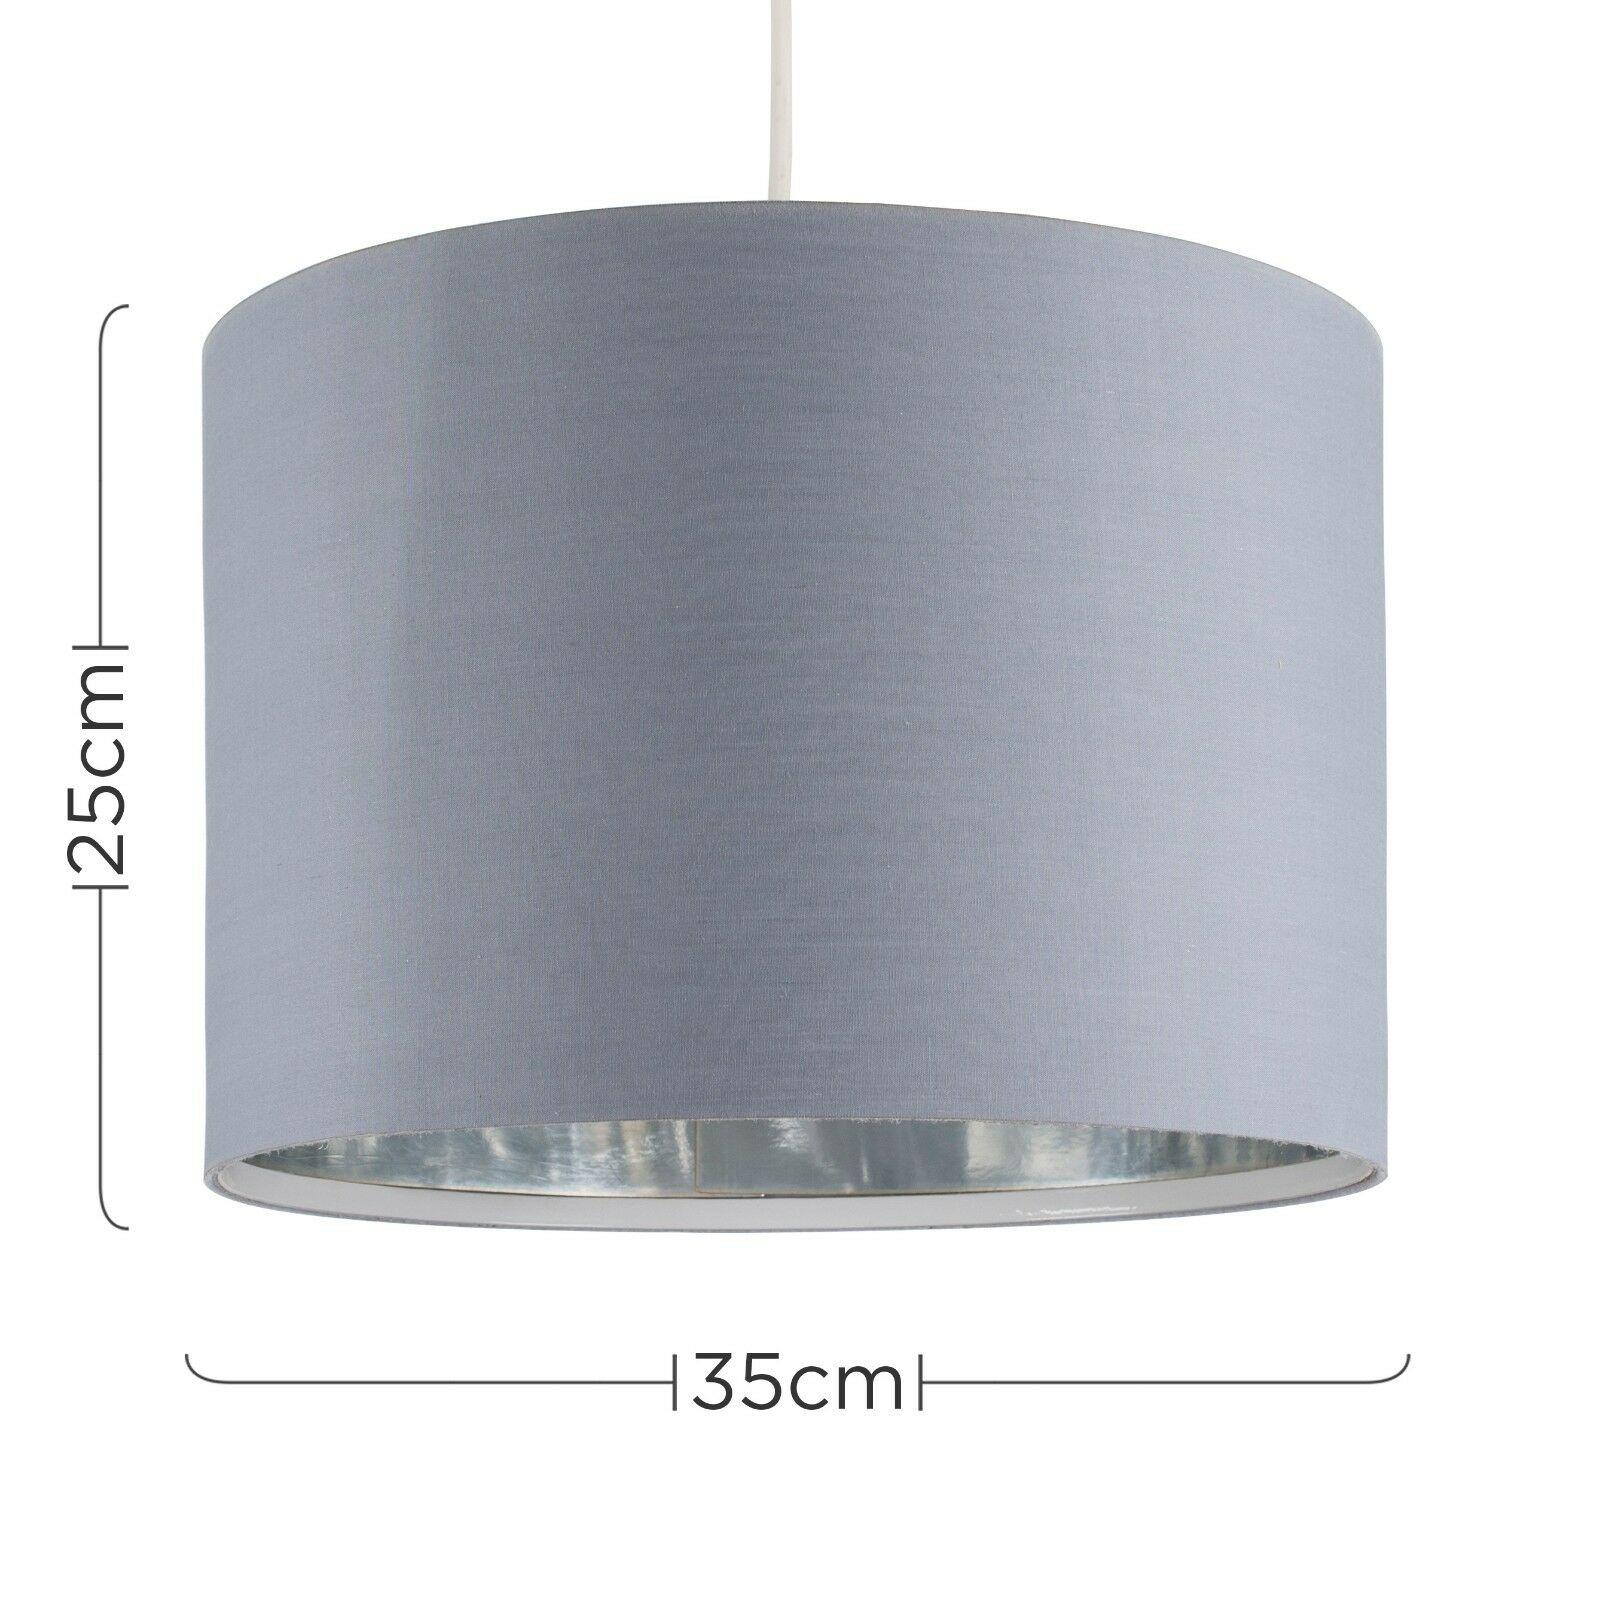 Tela-moderna-algodon-facil-ajuste-Techo-Colgante-Pantalla-De-Mesa-tonos-de-luz-de-tambor miniatura 124